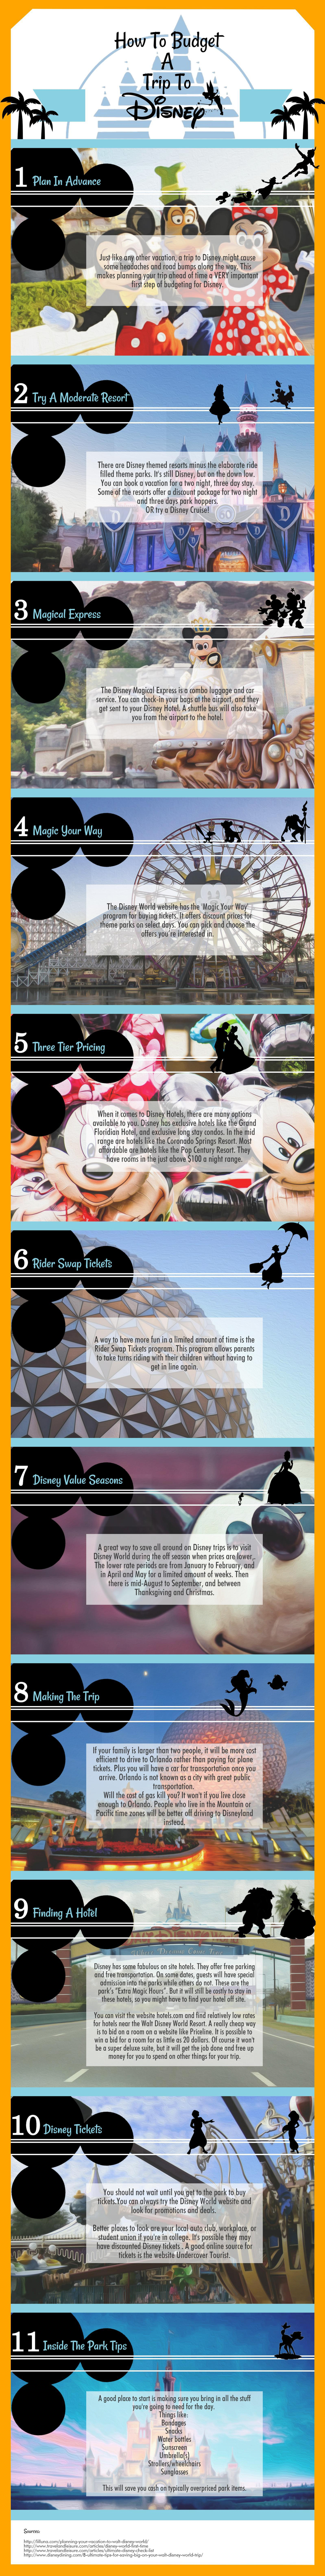 How To Budget A Disney Trip - Infographic1